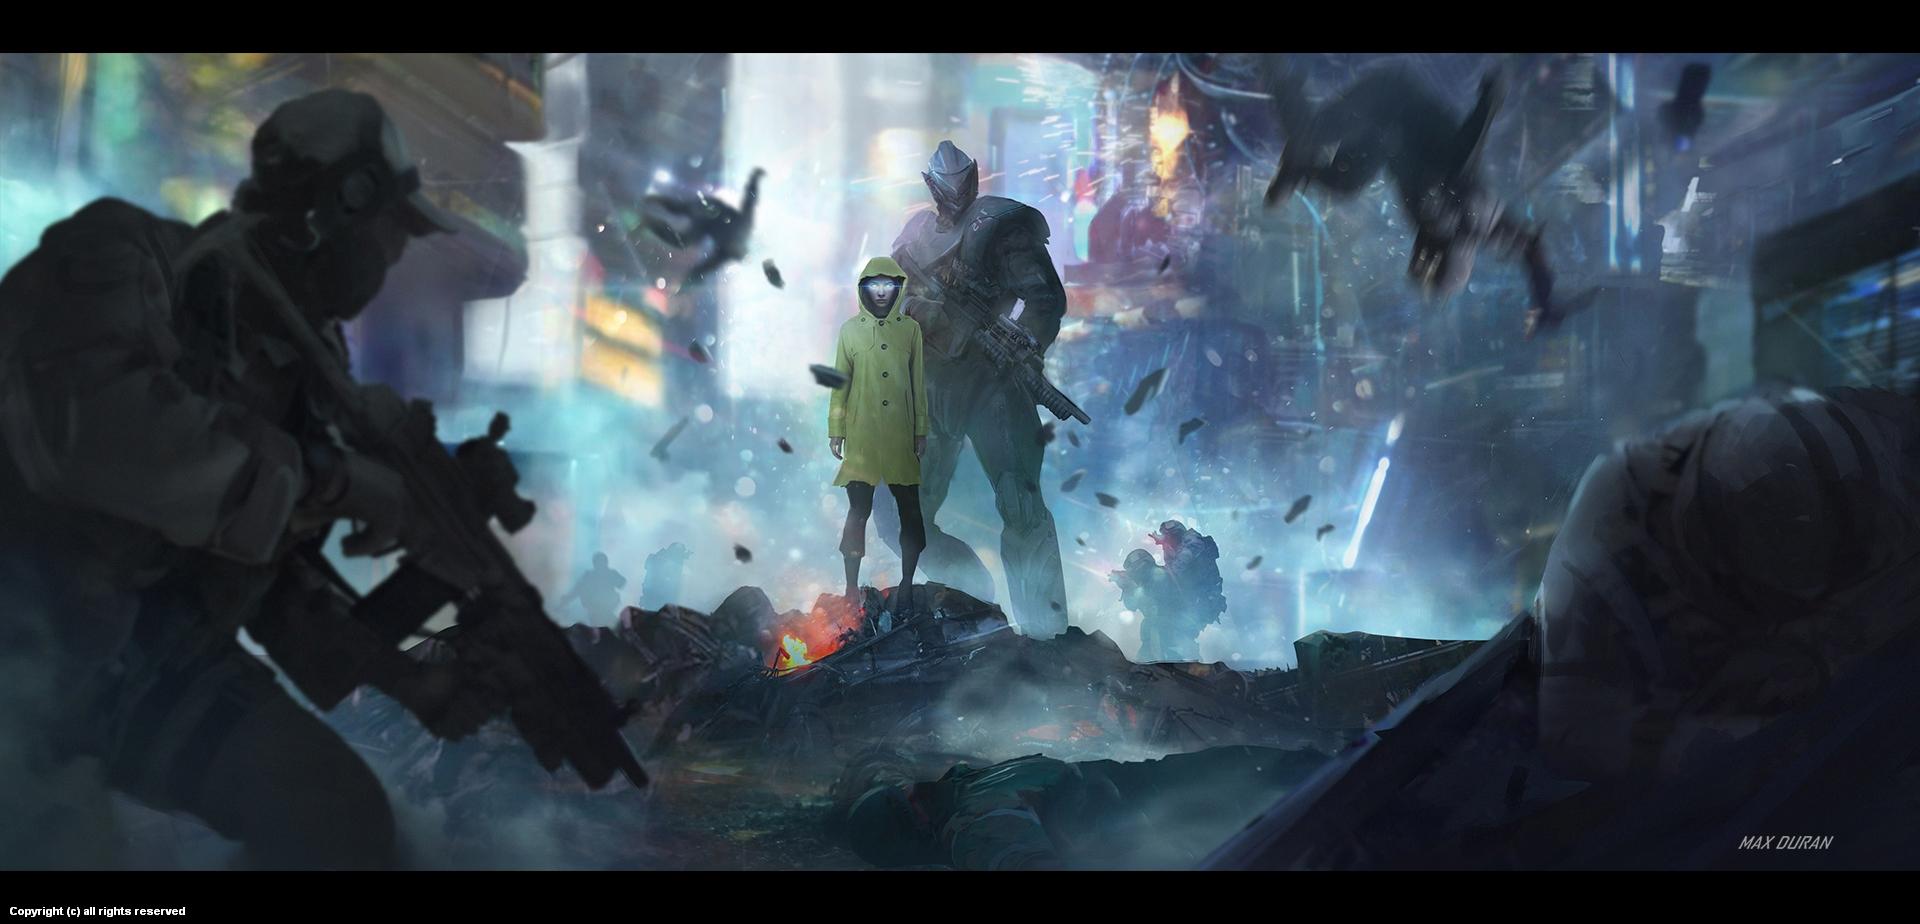 Beyond Human - Keyframe  Artwork by Max Duran